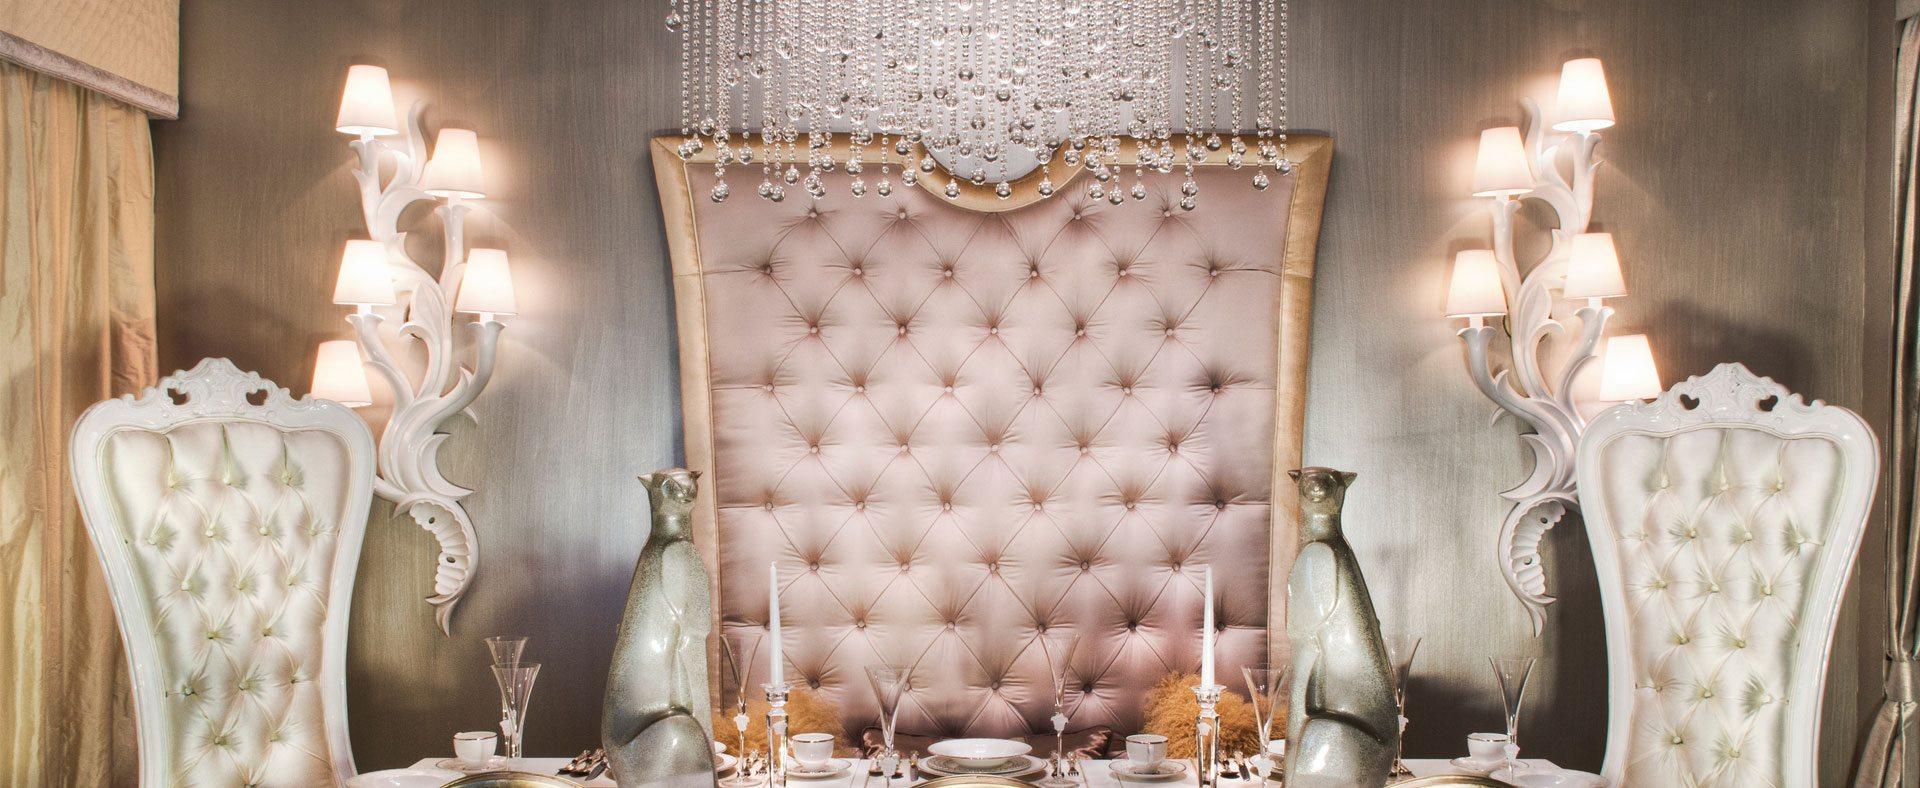 charles-neal-dining-interior-design